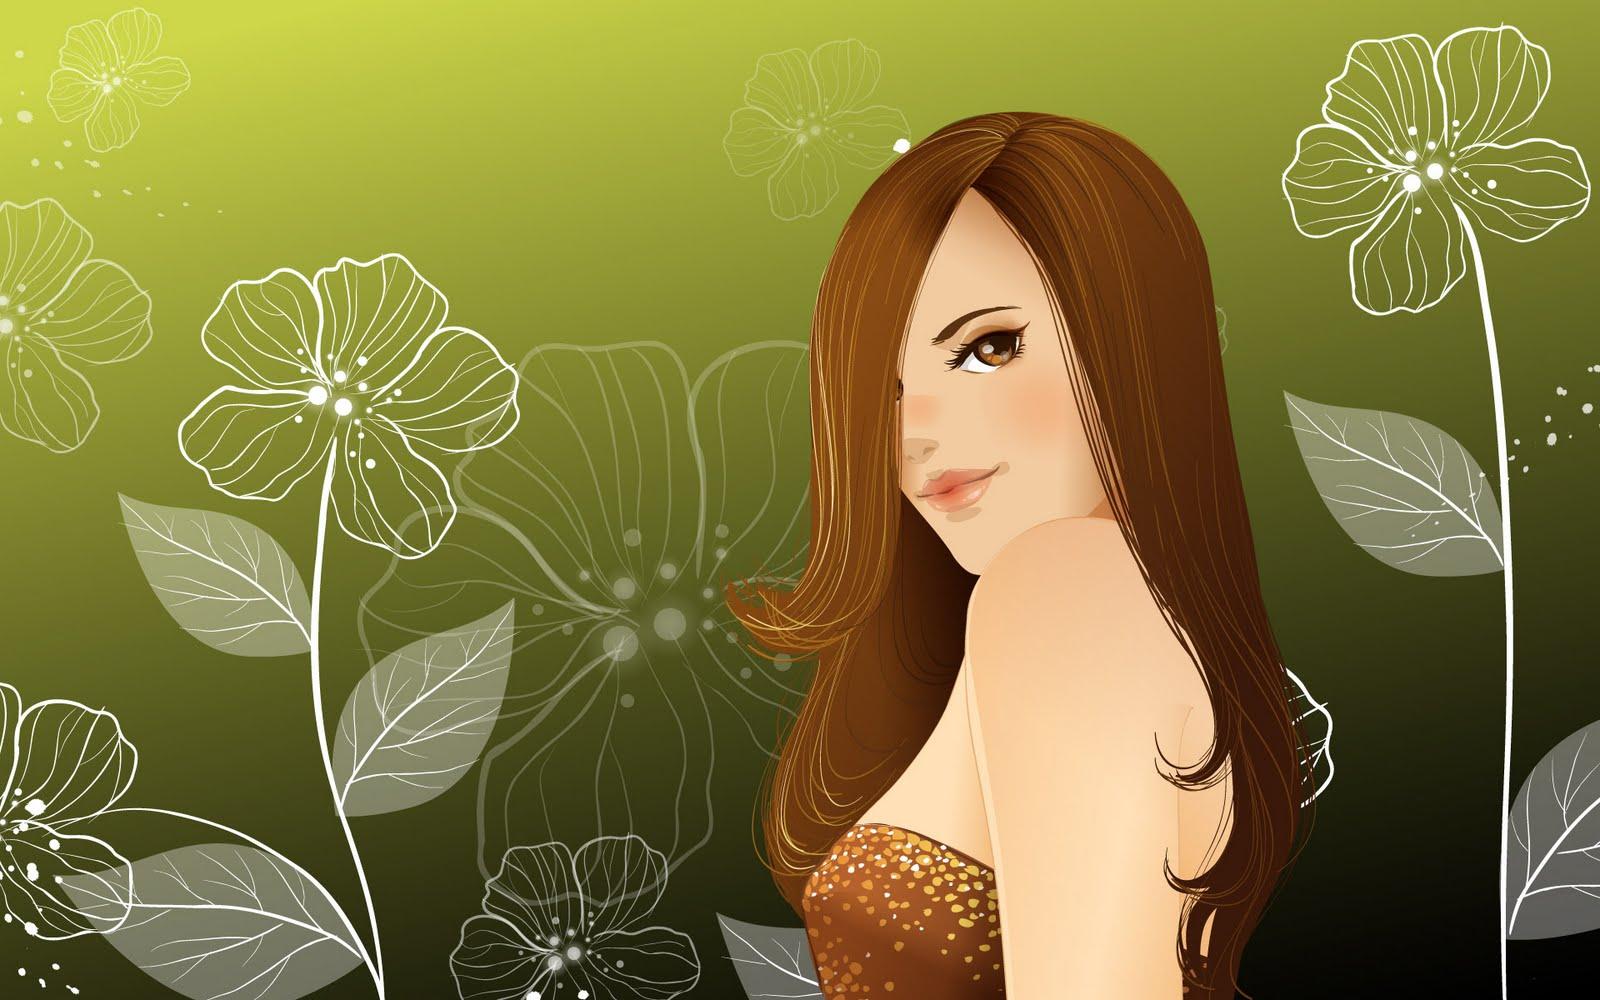 http://3.bp.blogspot.com/-YE_ukSnUP2g/TfMBMCnCRLI/AAAAAAAABnc/CjR_jgGVpcA/s1600/vektor_girl_wallpaper.jpg